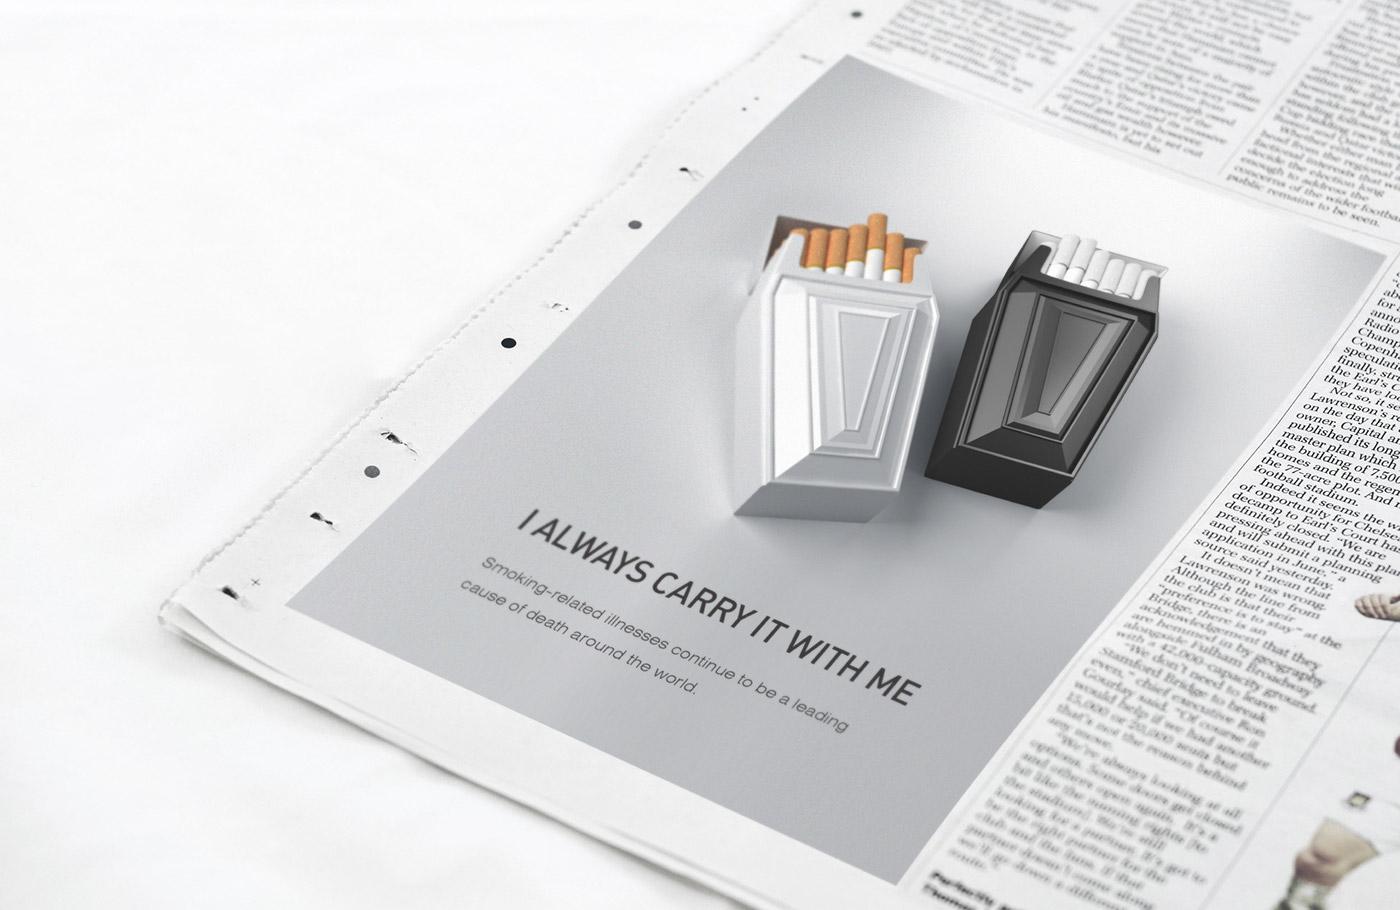 Pack package cigarette antismoke pack social advertising identity logo development brand identity mark sign applications Logotype social smoke antismoke